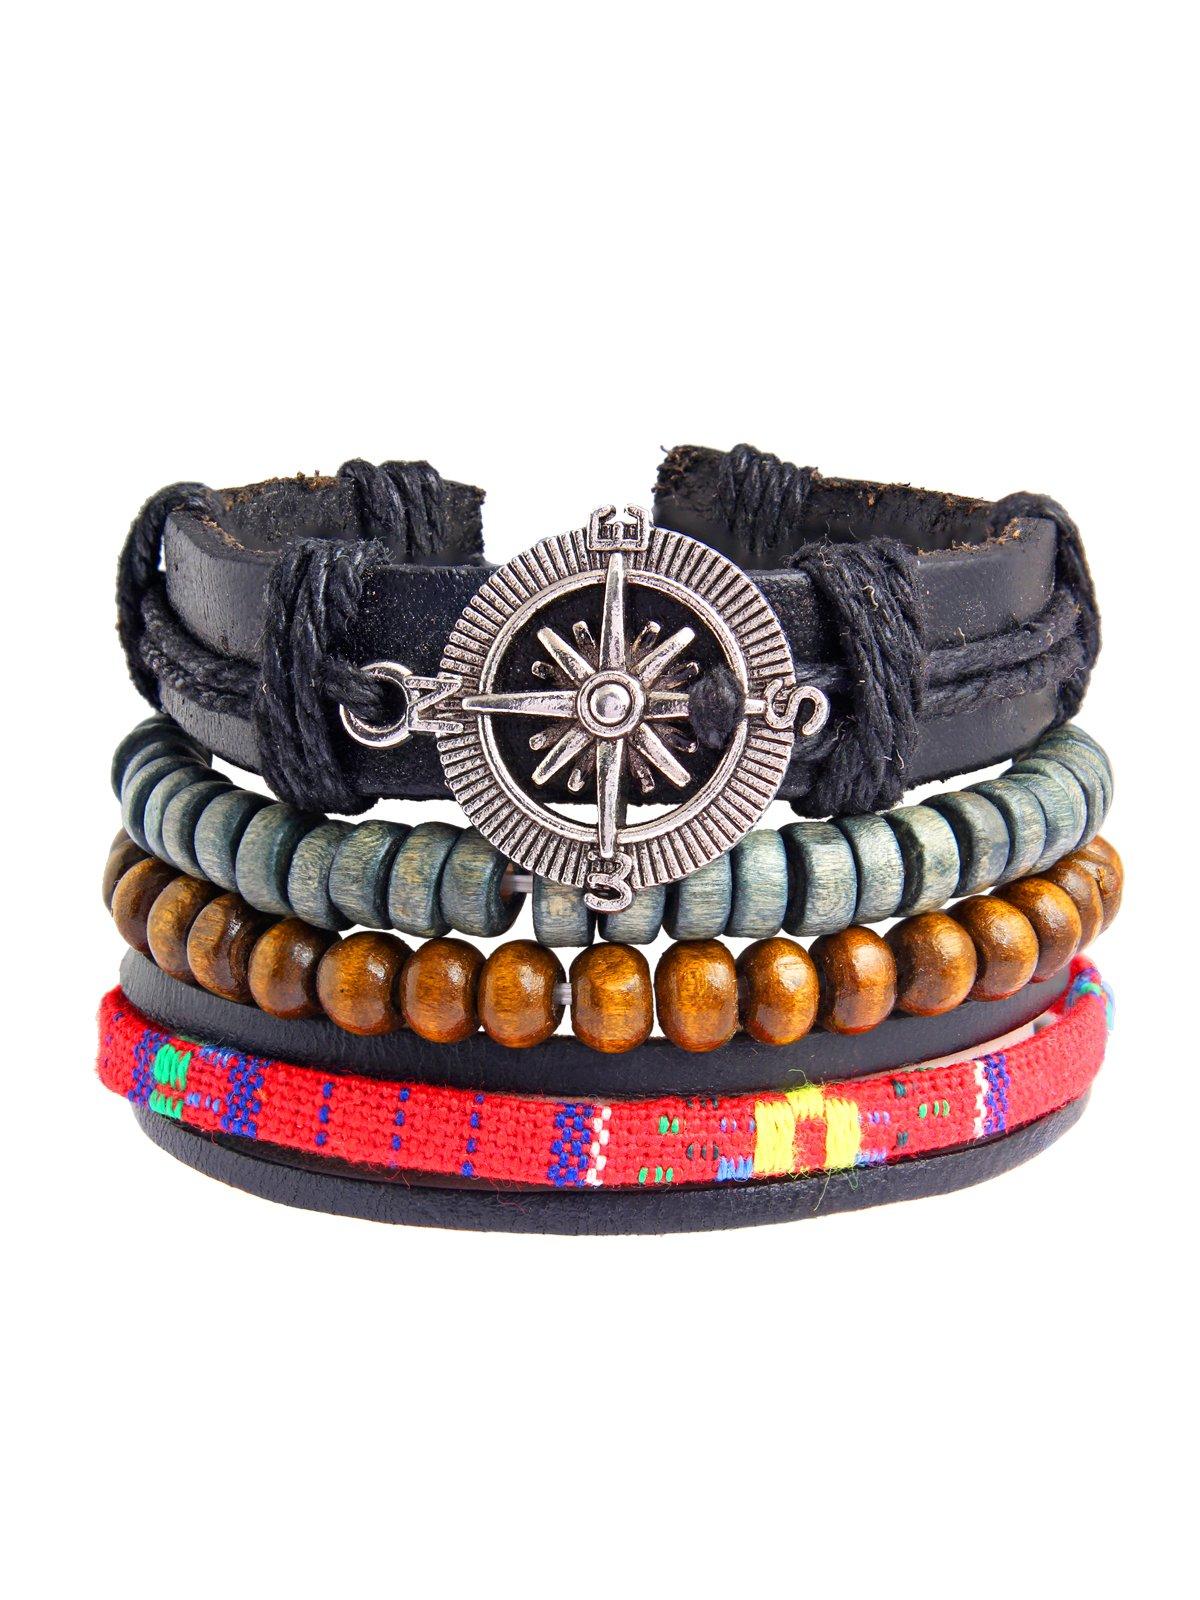 The Jewelbox Zivom Handcrafted Black Leather Wood Tibetan Beads Wrist Band Multi Strand Bracelet Men Boys